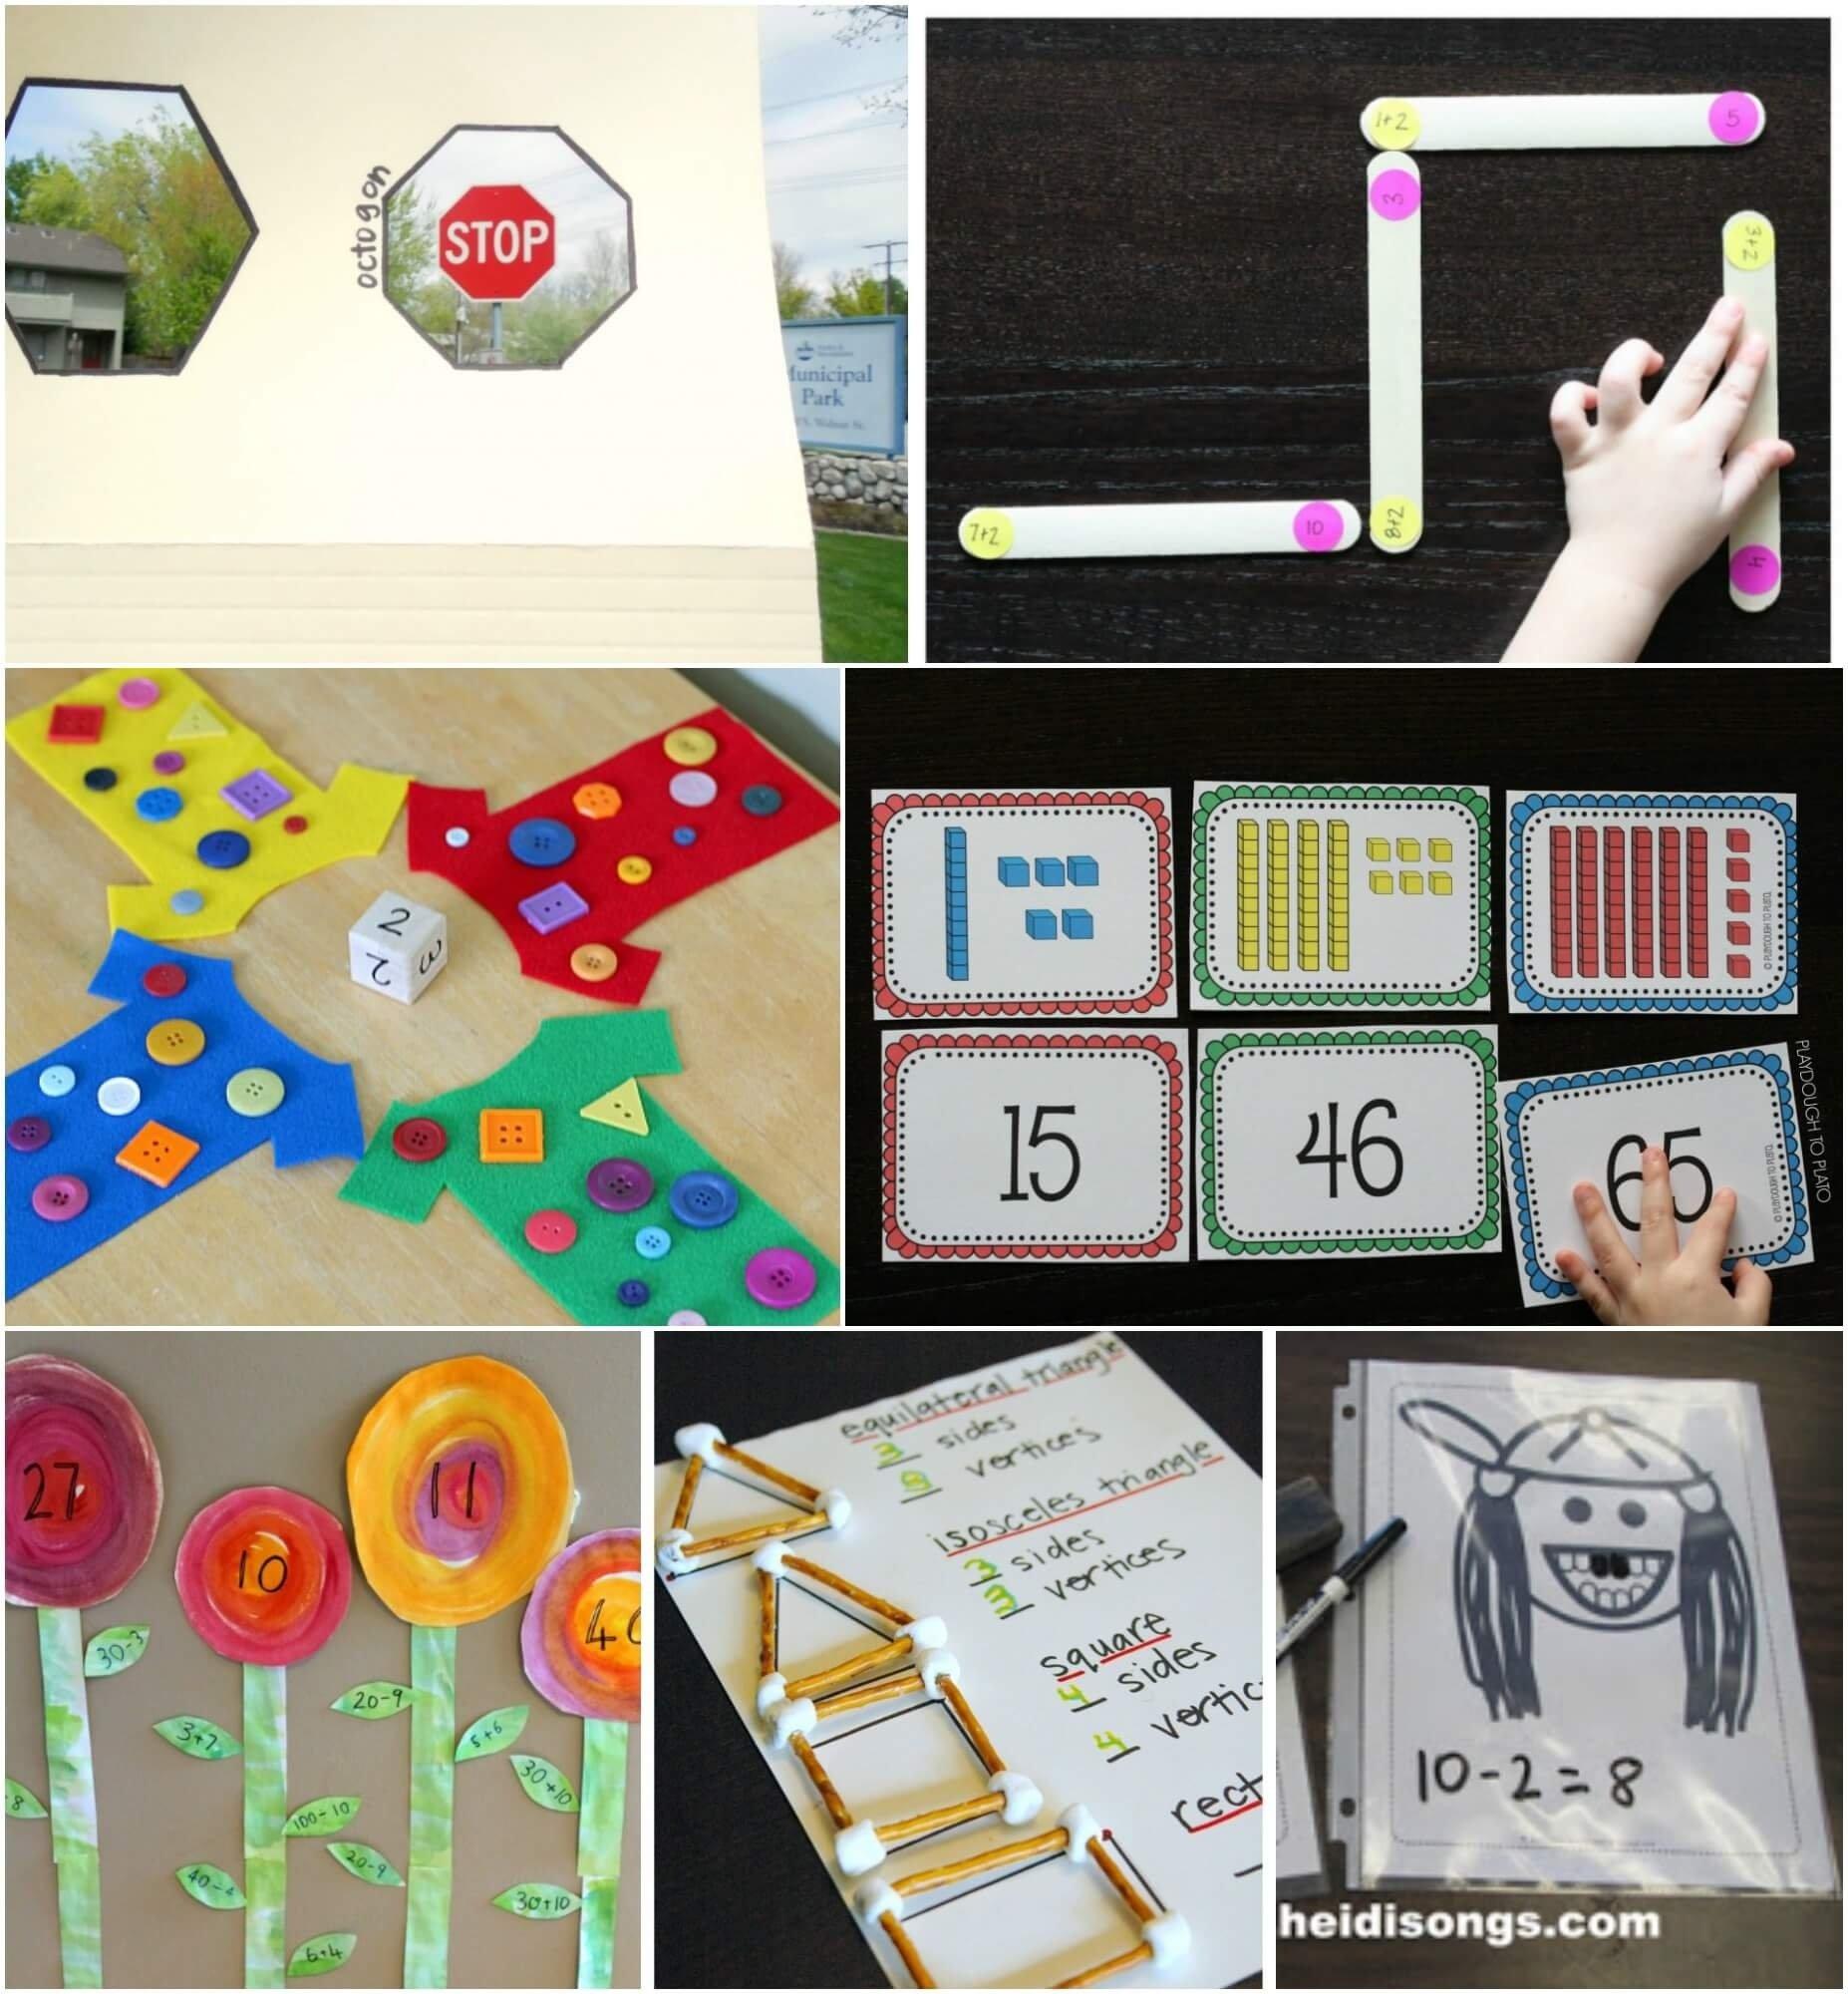 10 Stylish Main Idea Games For Kids 40 stem activities for kids playdough to plato 2020